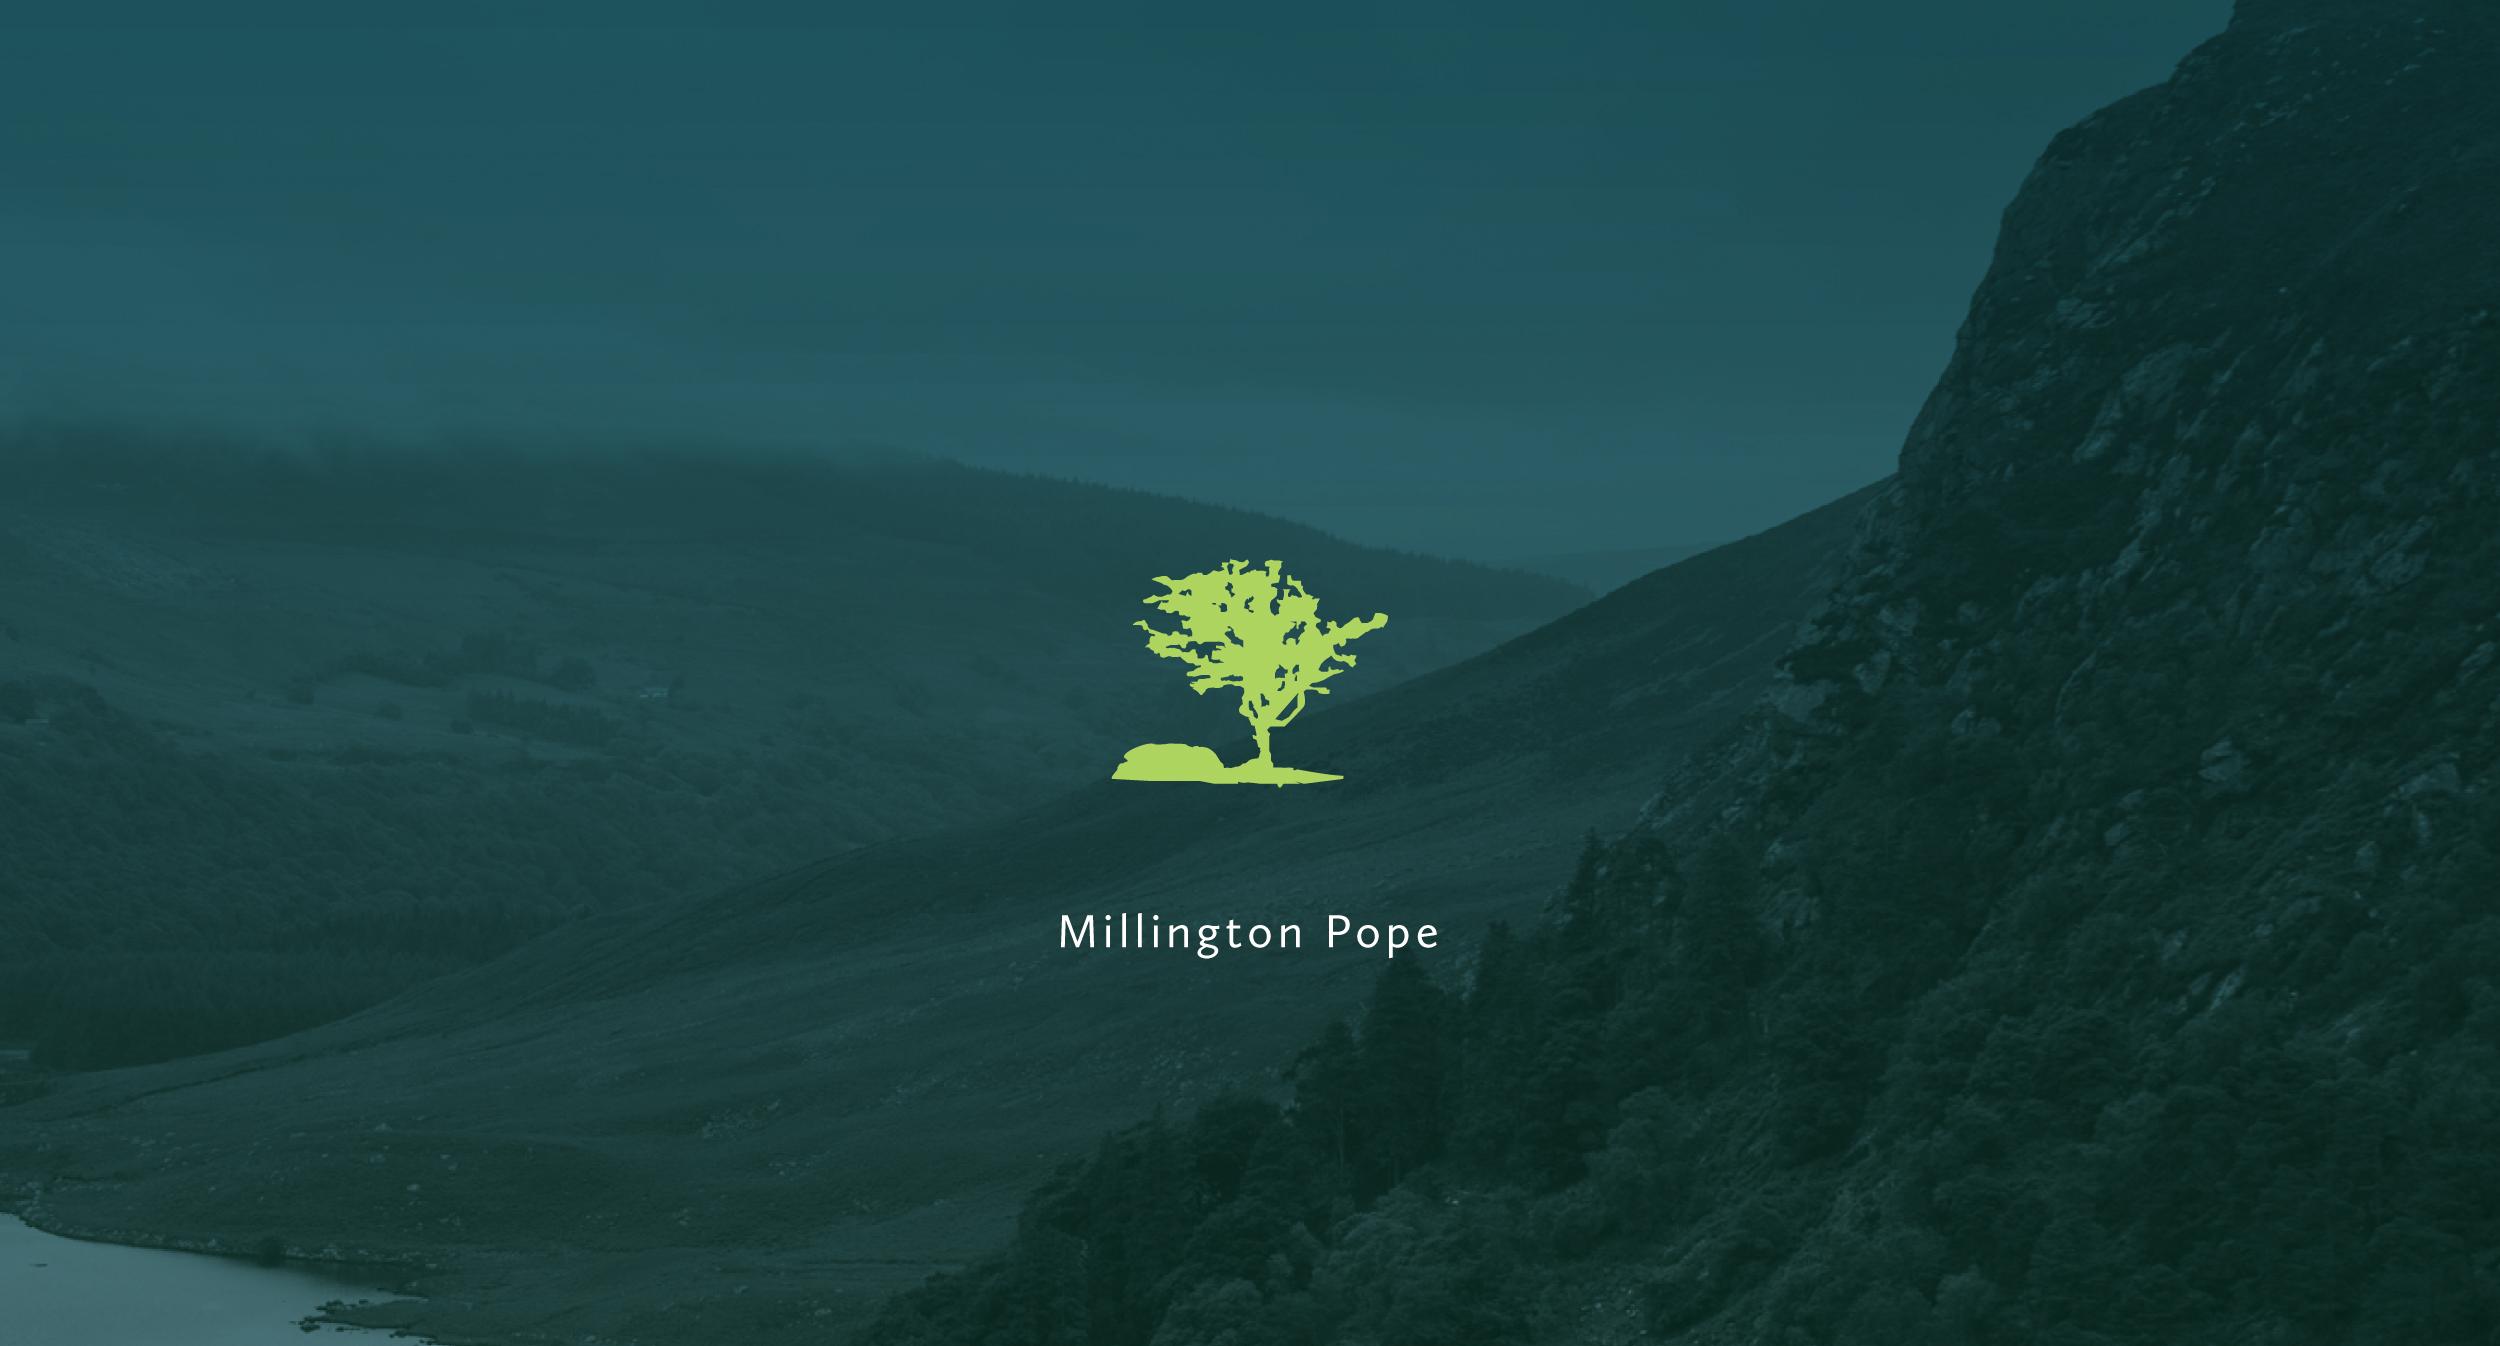 Cover image: Millington Pope